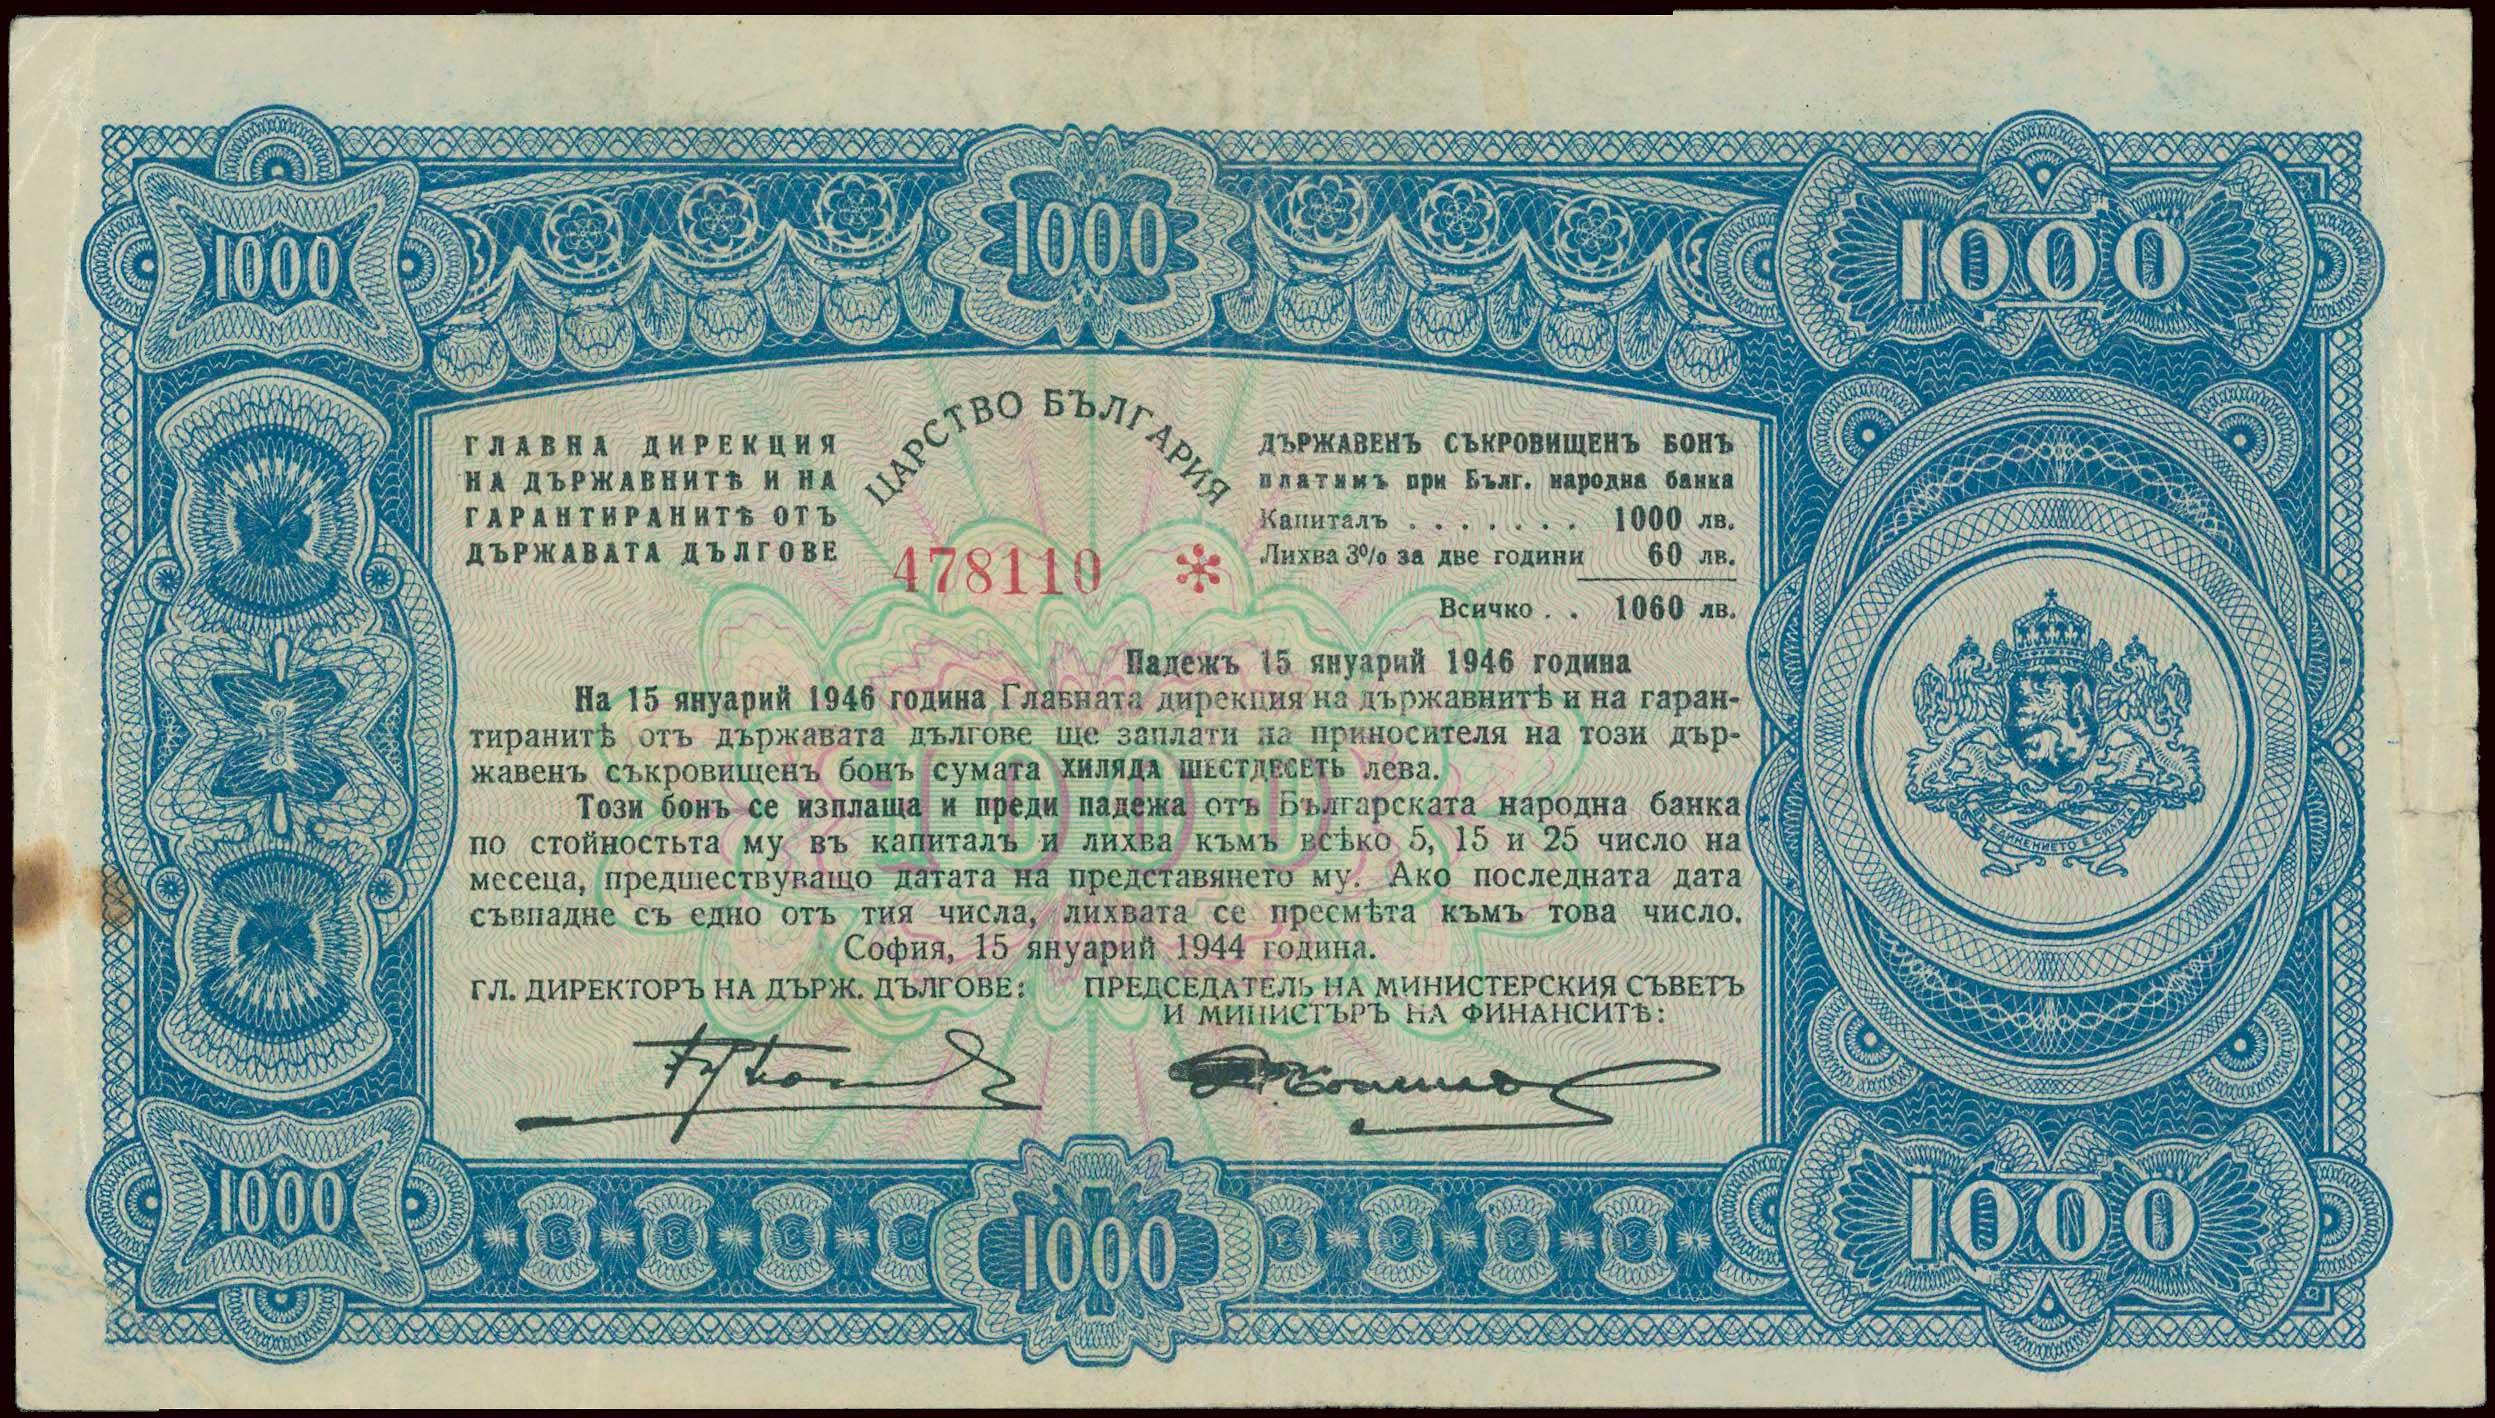 Lot 6671 - -  PAPER MONEY - BANKNOTES BULGARIAN OCCUPATION -  A. Karamitsos Public & Live Internet Auction 676 Day 1